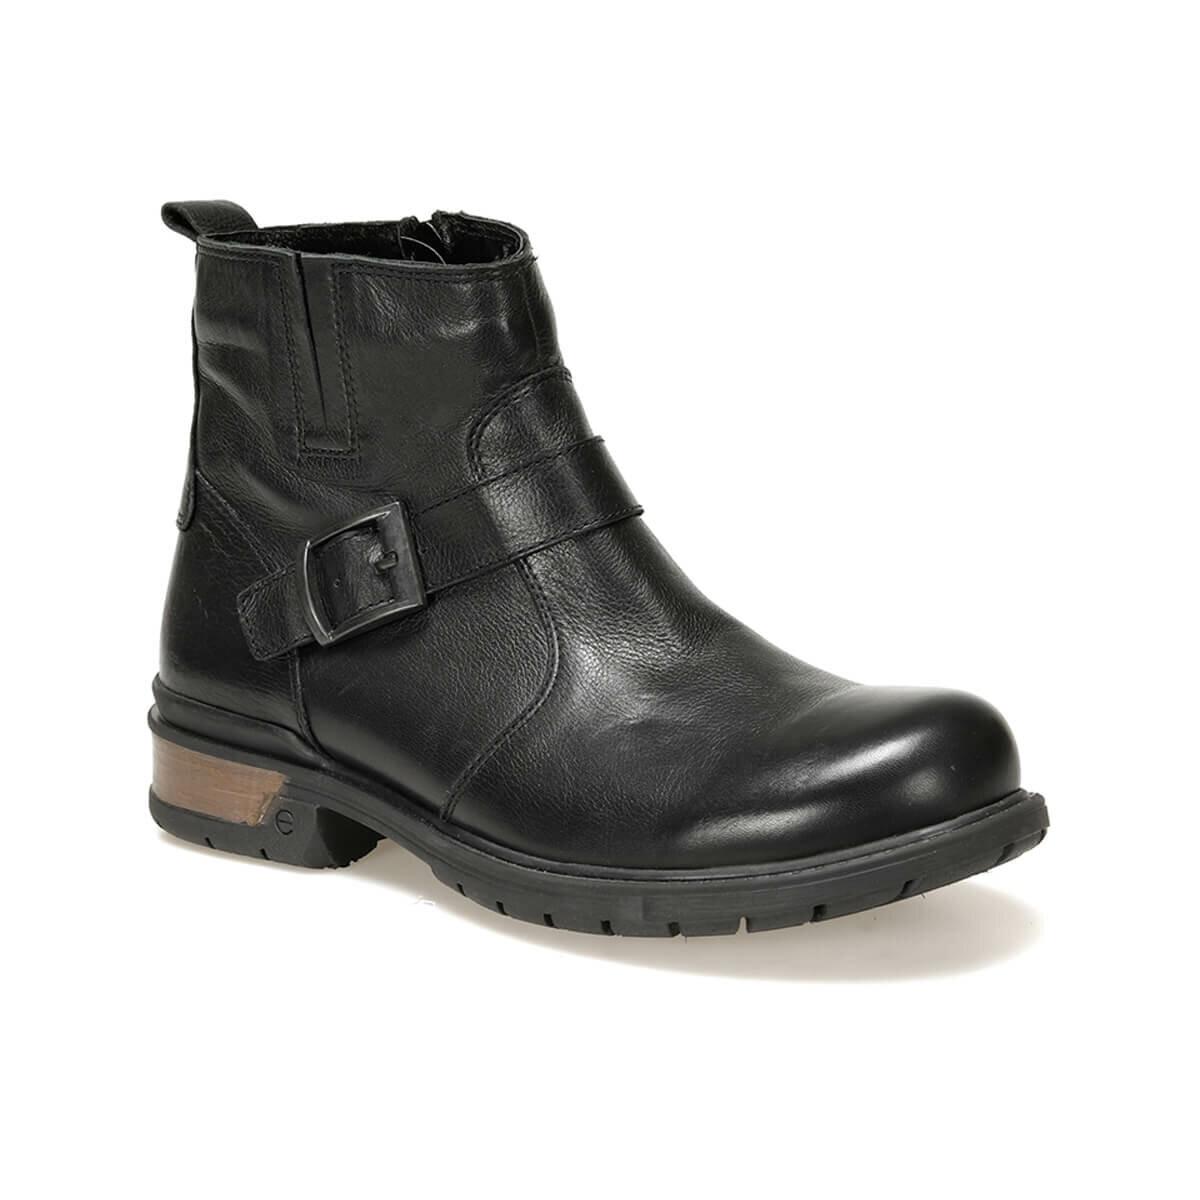 FLO 3103 C 19 Black Men Boots Forester